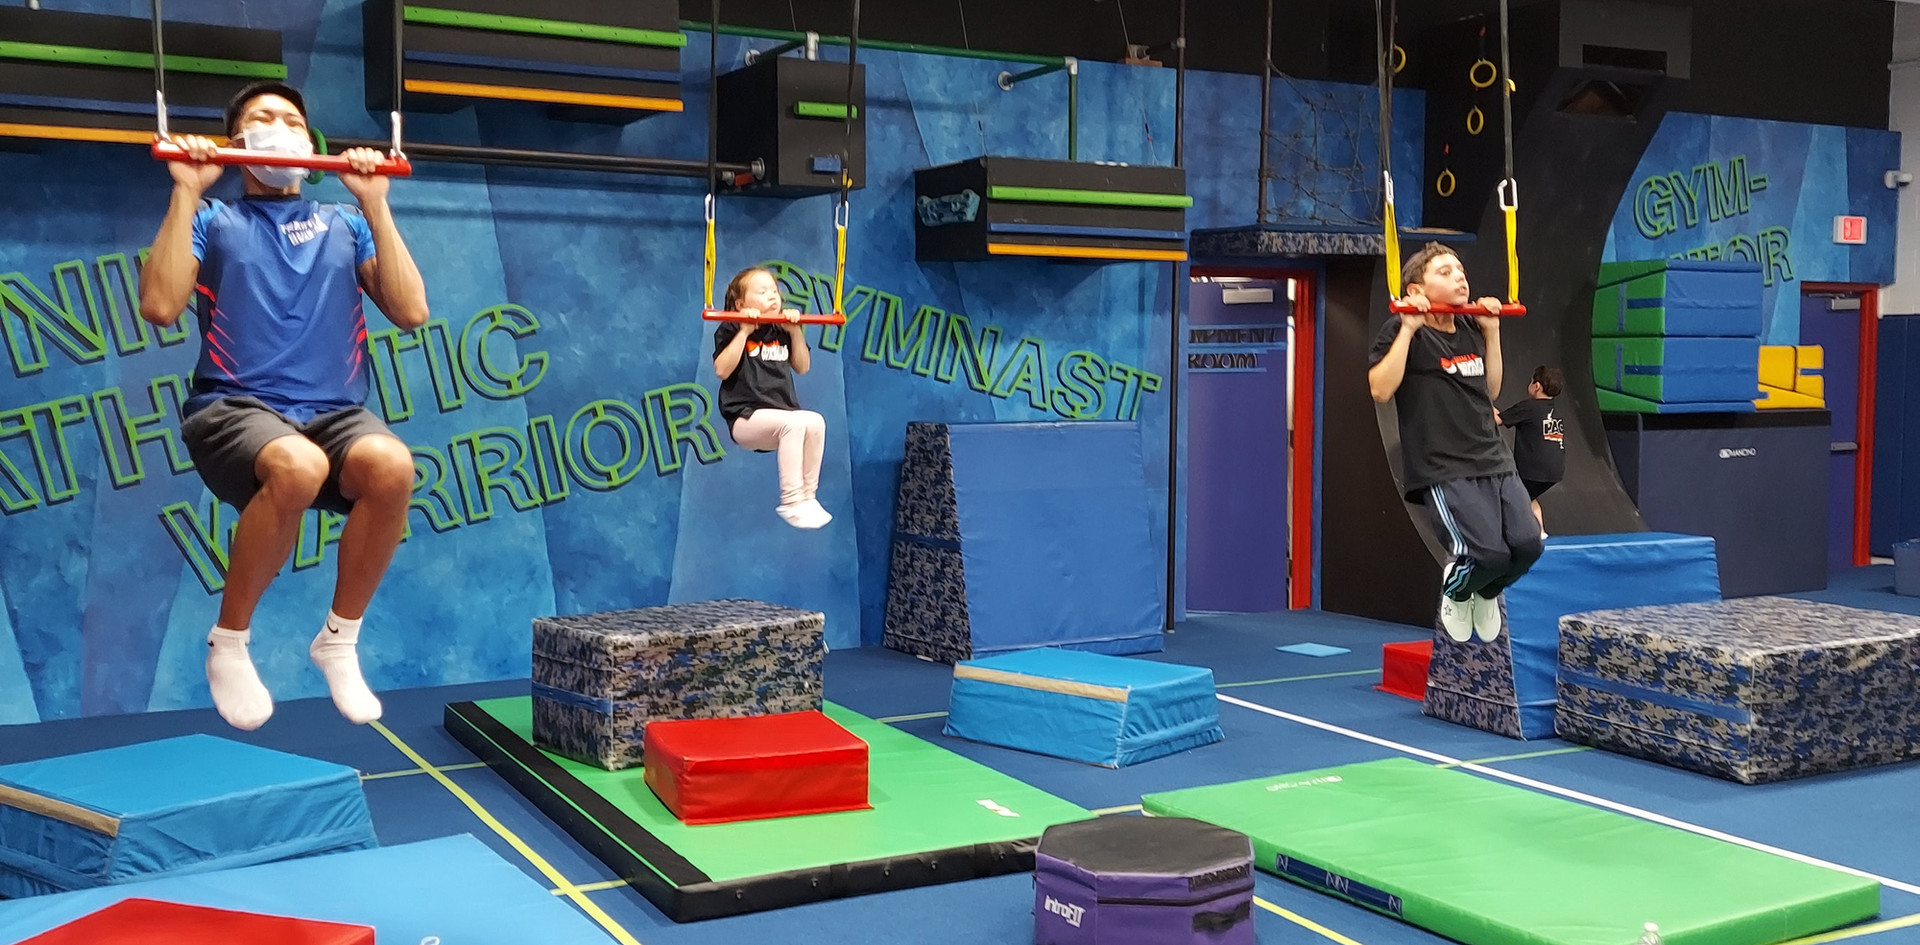 Ninja Warrior Trapeze Stations